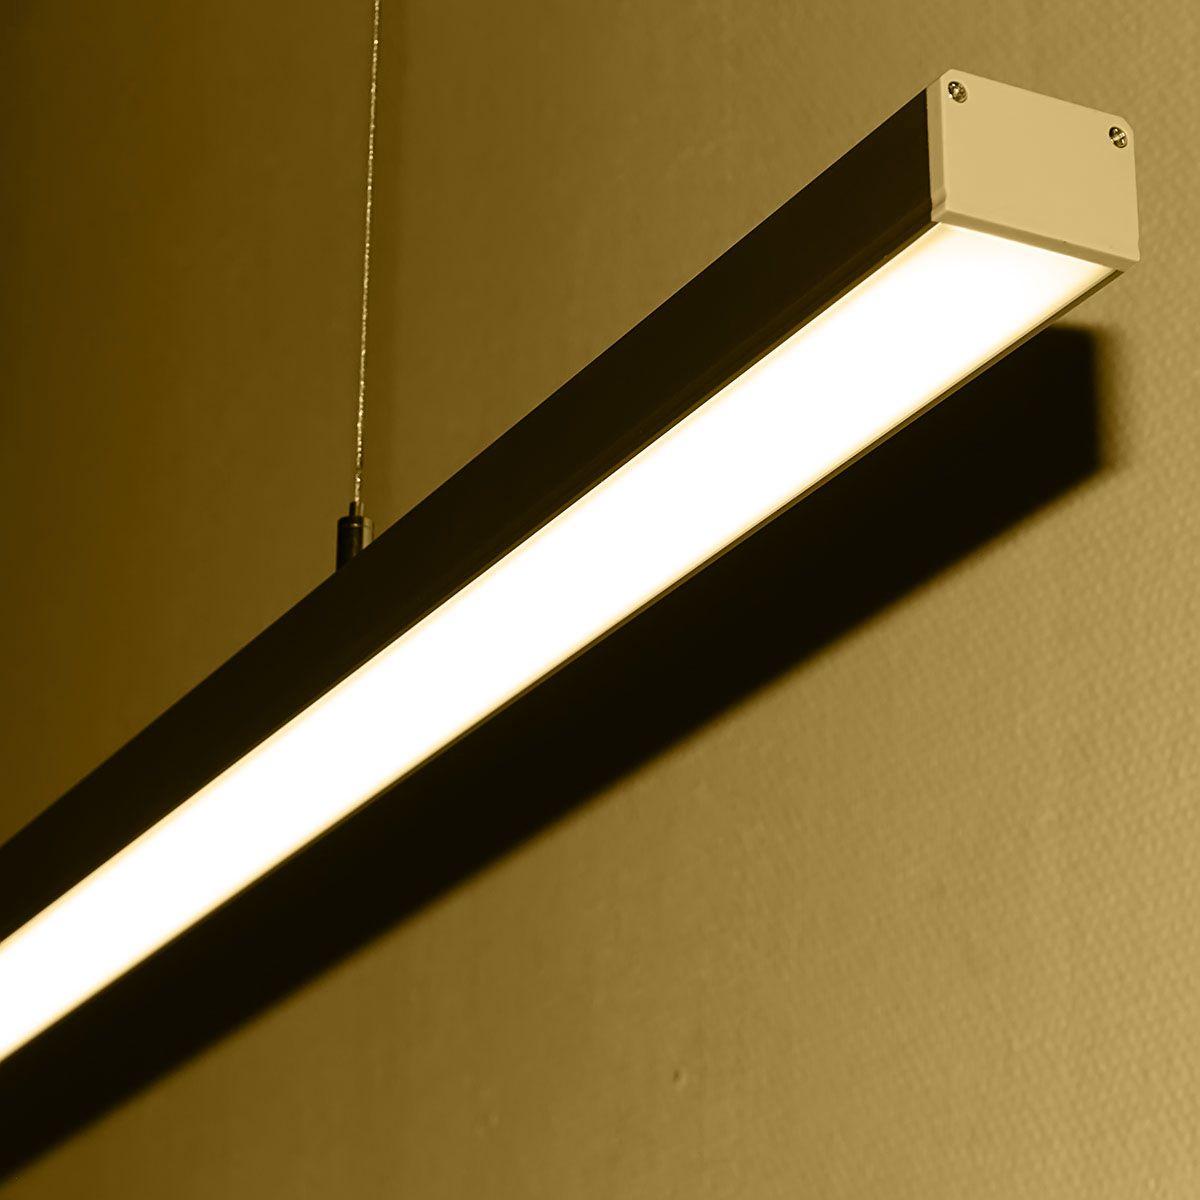 24V Aluminium LED Pendelleuchte – warmweiß – linear – diffuse Abdeckung